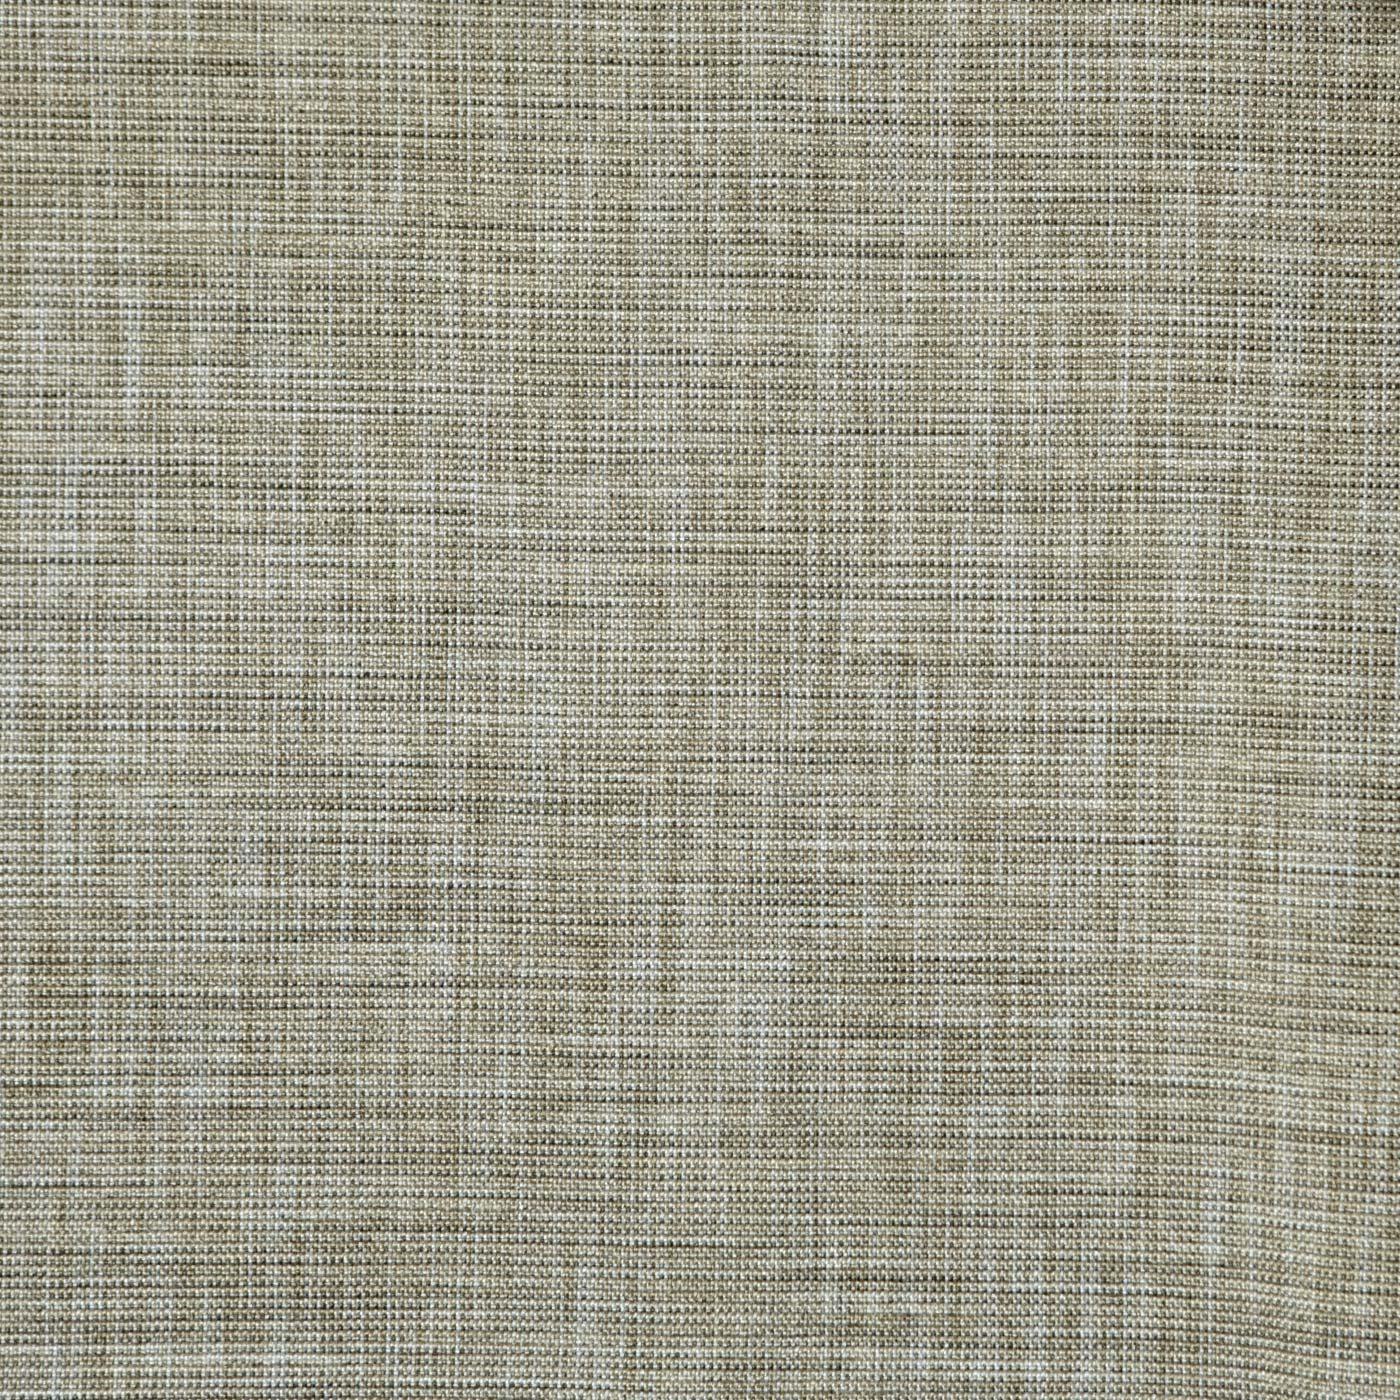 Hawes Linen